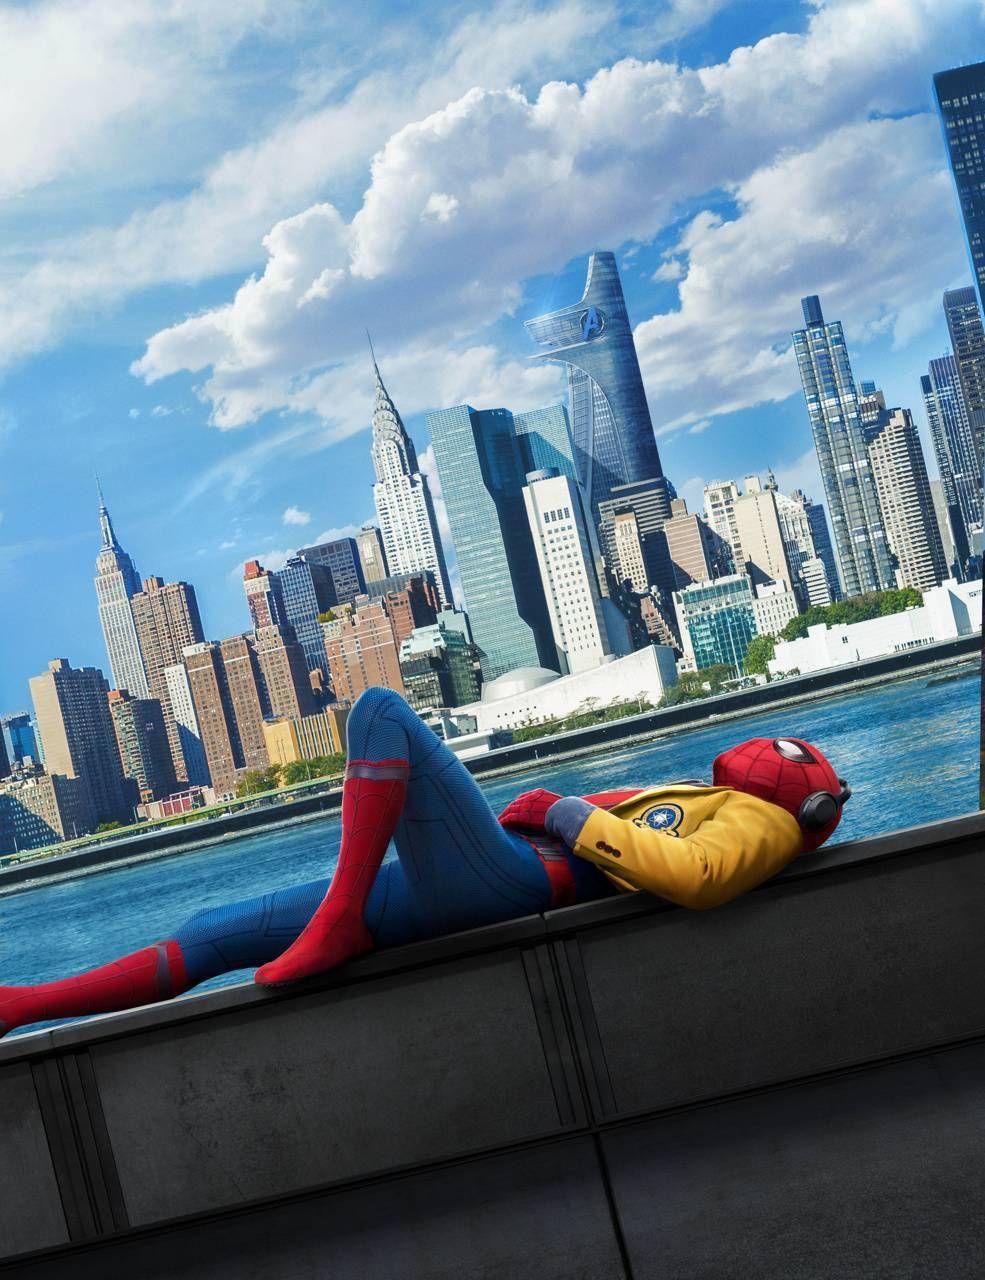 Spider man wallpaper by silverbull735 - da - Free on ZEDGE™